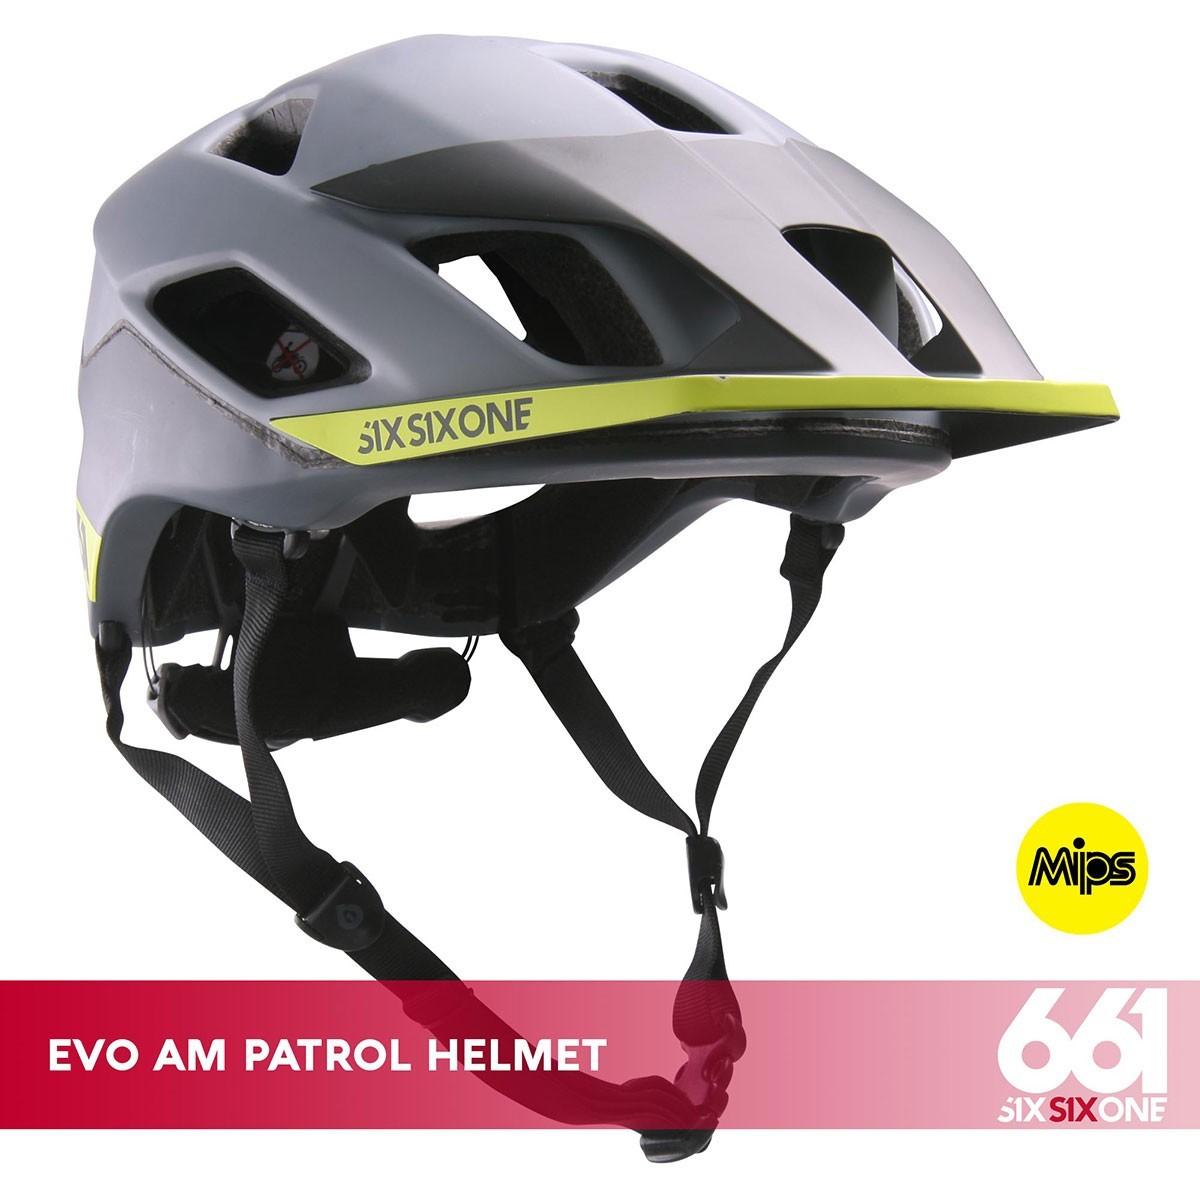 661 EVO AM PATROL MIPS CE MATTE GRAY - Изображение - AQUAMATRIX